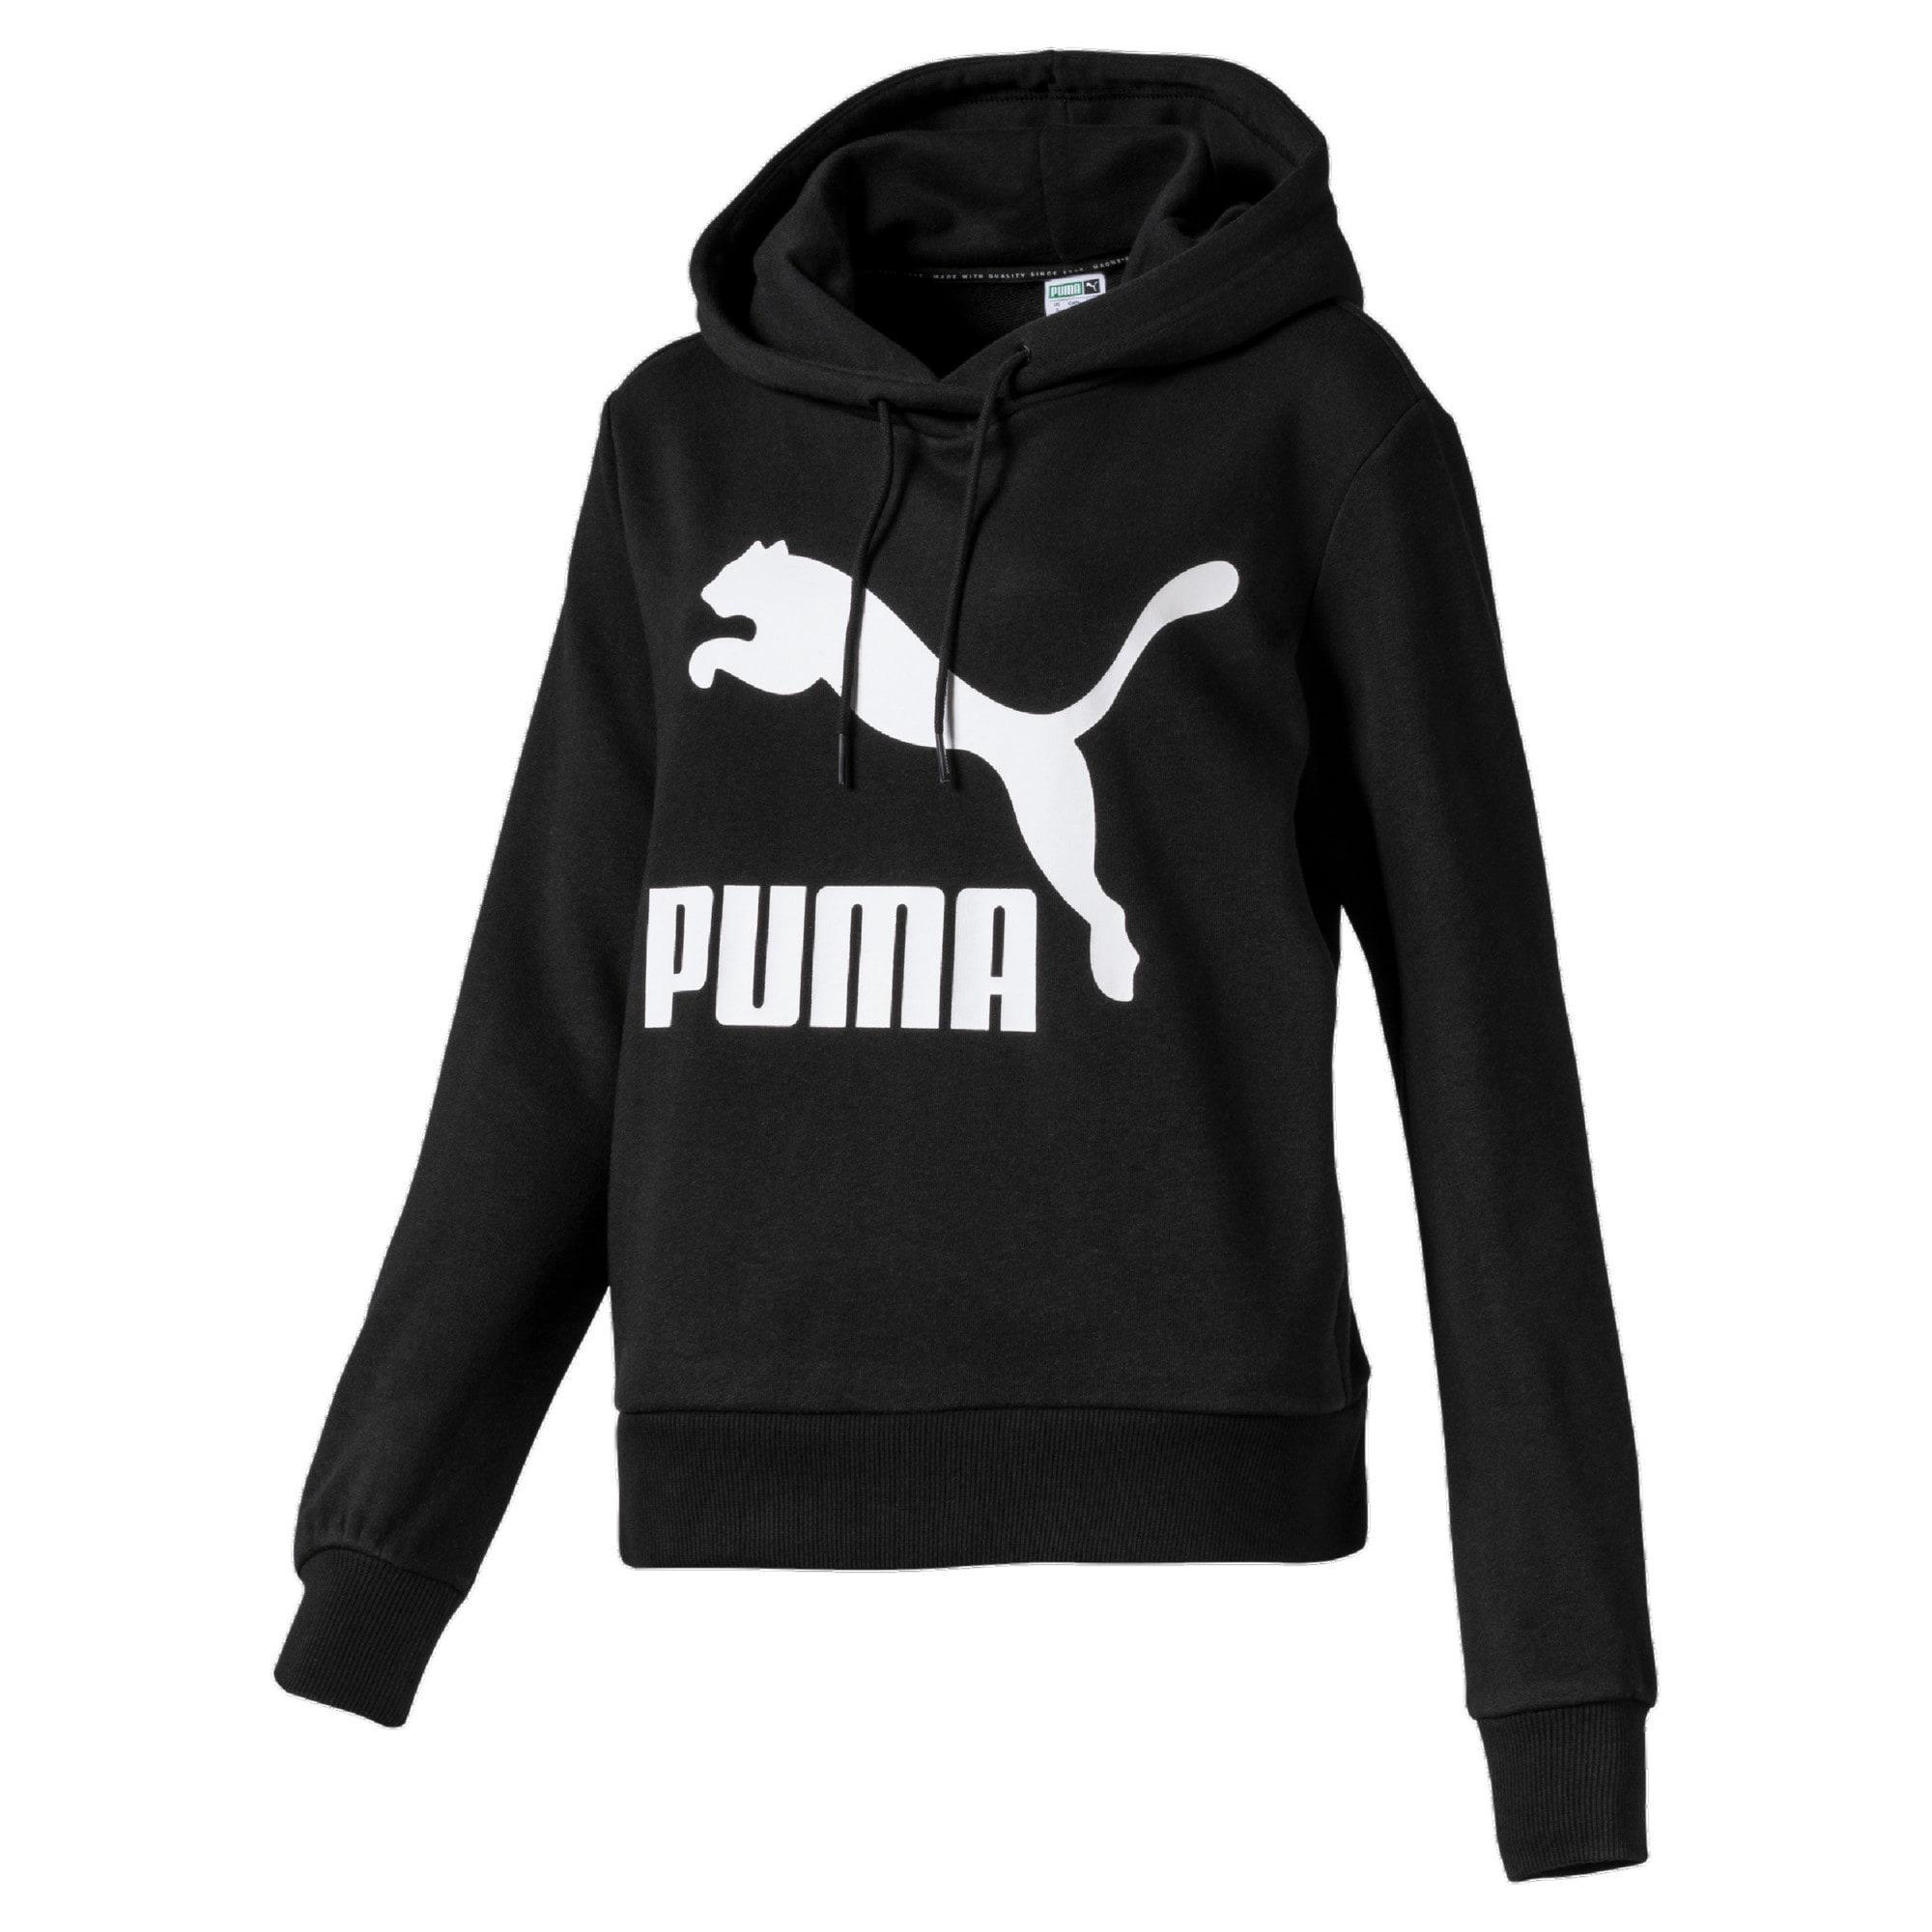 Thumbnail 1 of Classics Logo Women's Hoodie, Puma Black, medium